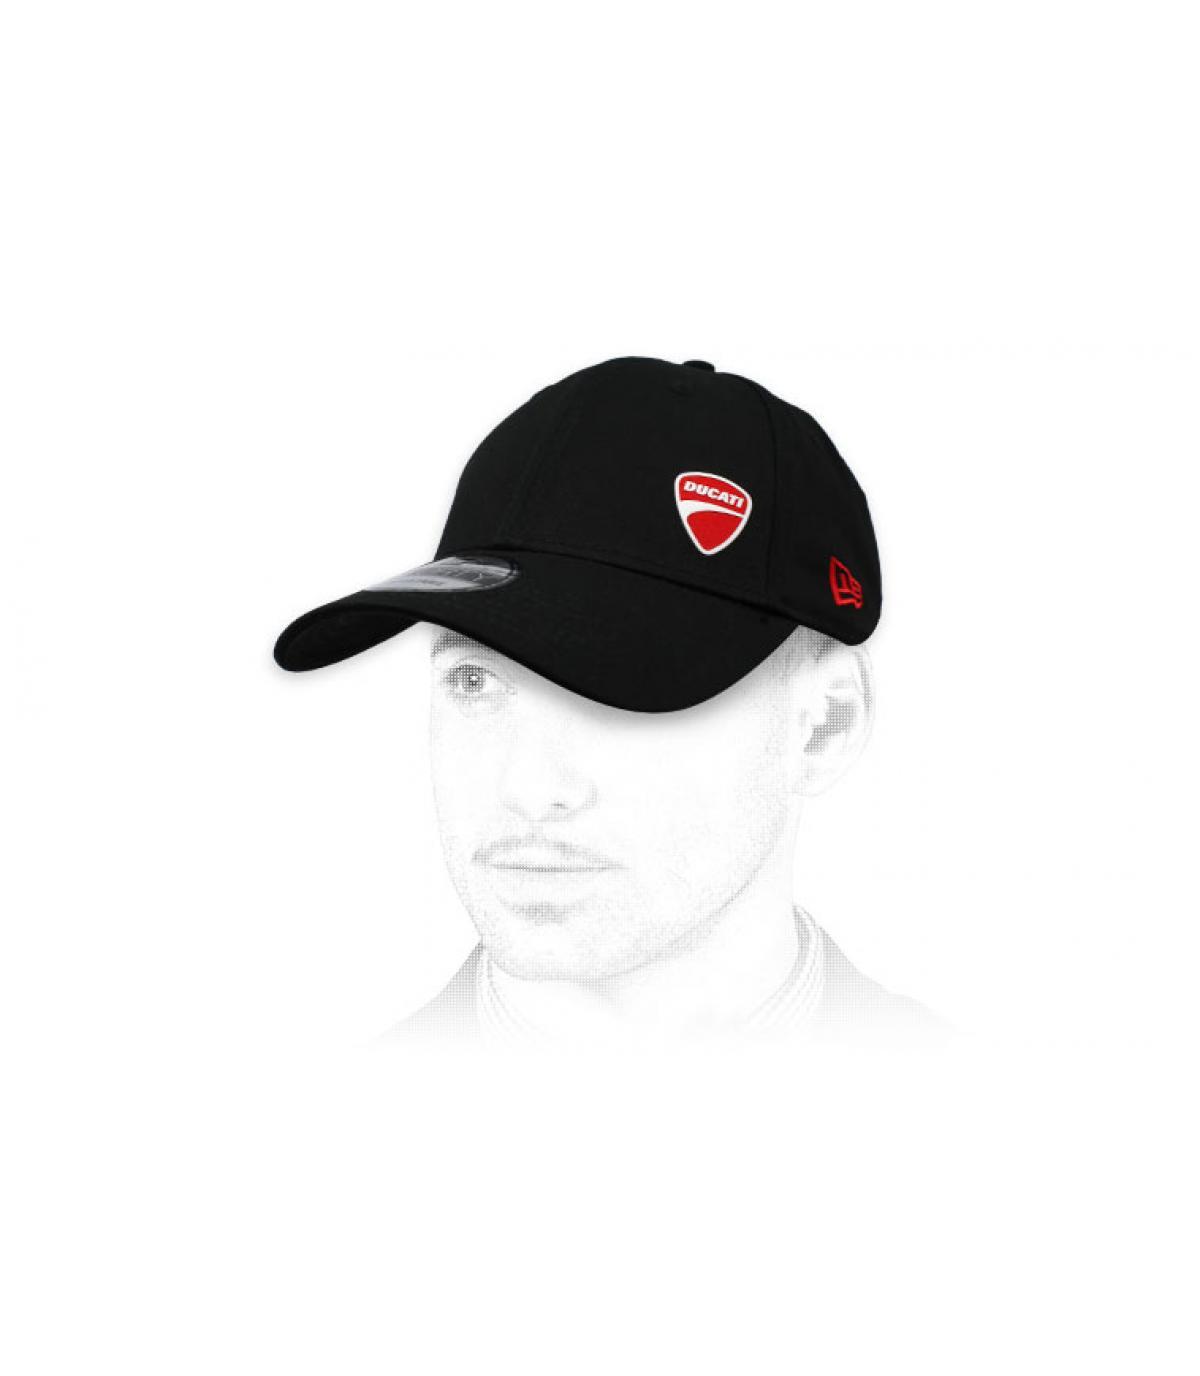 cappellino nero Ducati